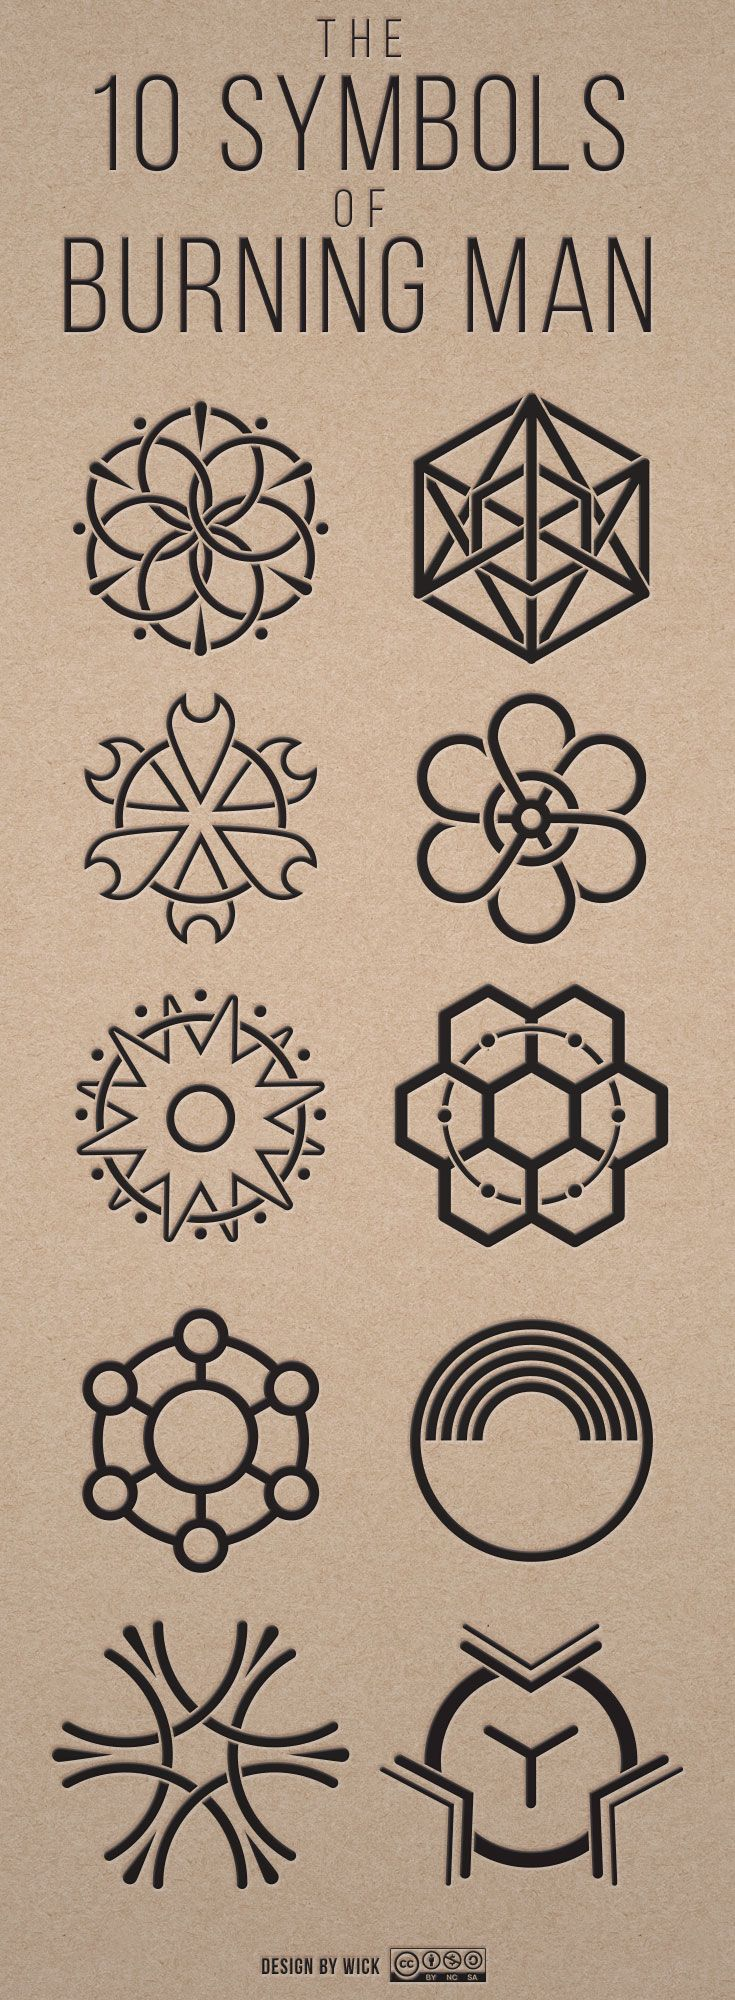 The 10 symbols of burning man symbols burning man and tattoo the 10 principles of burning man illustrated in symbols by wick buycottarizona Image collections